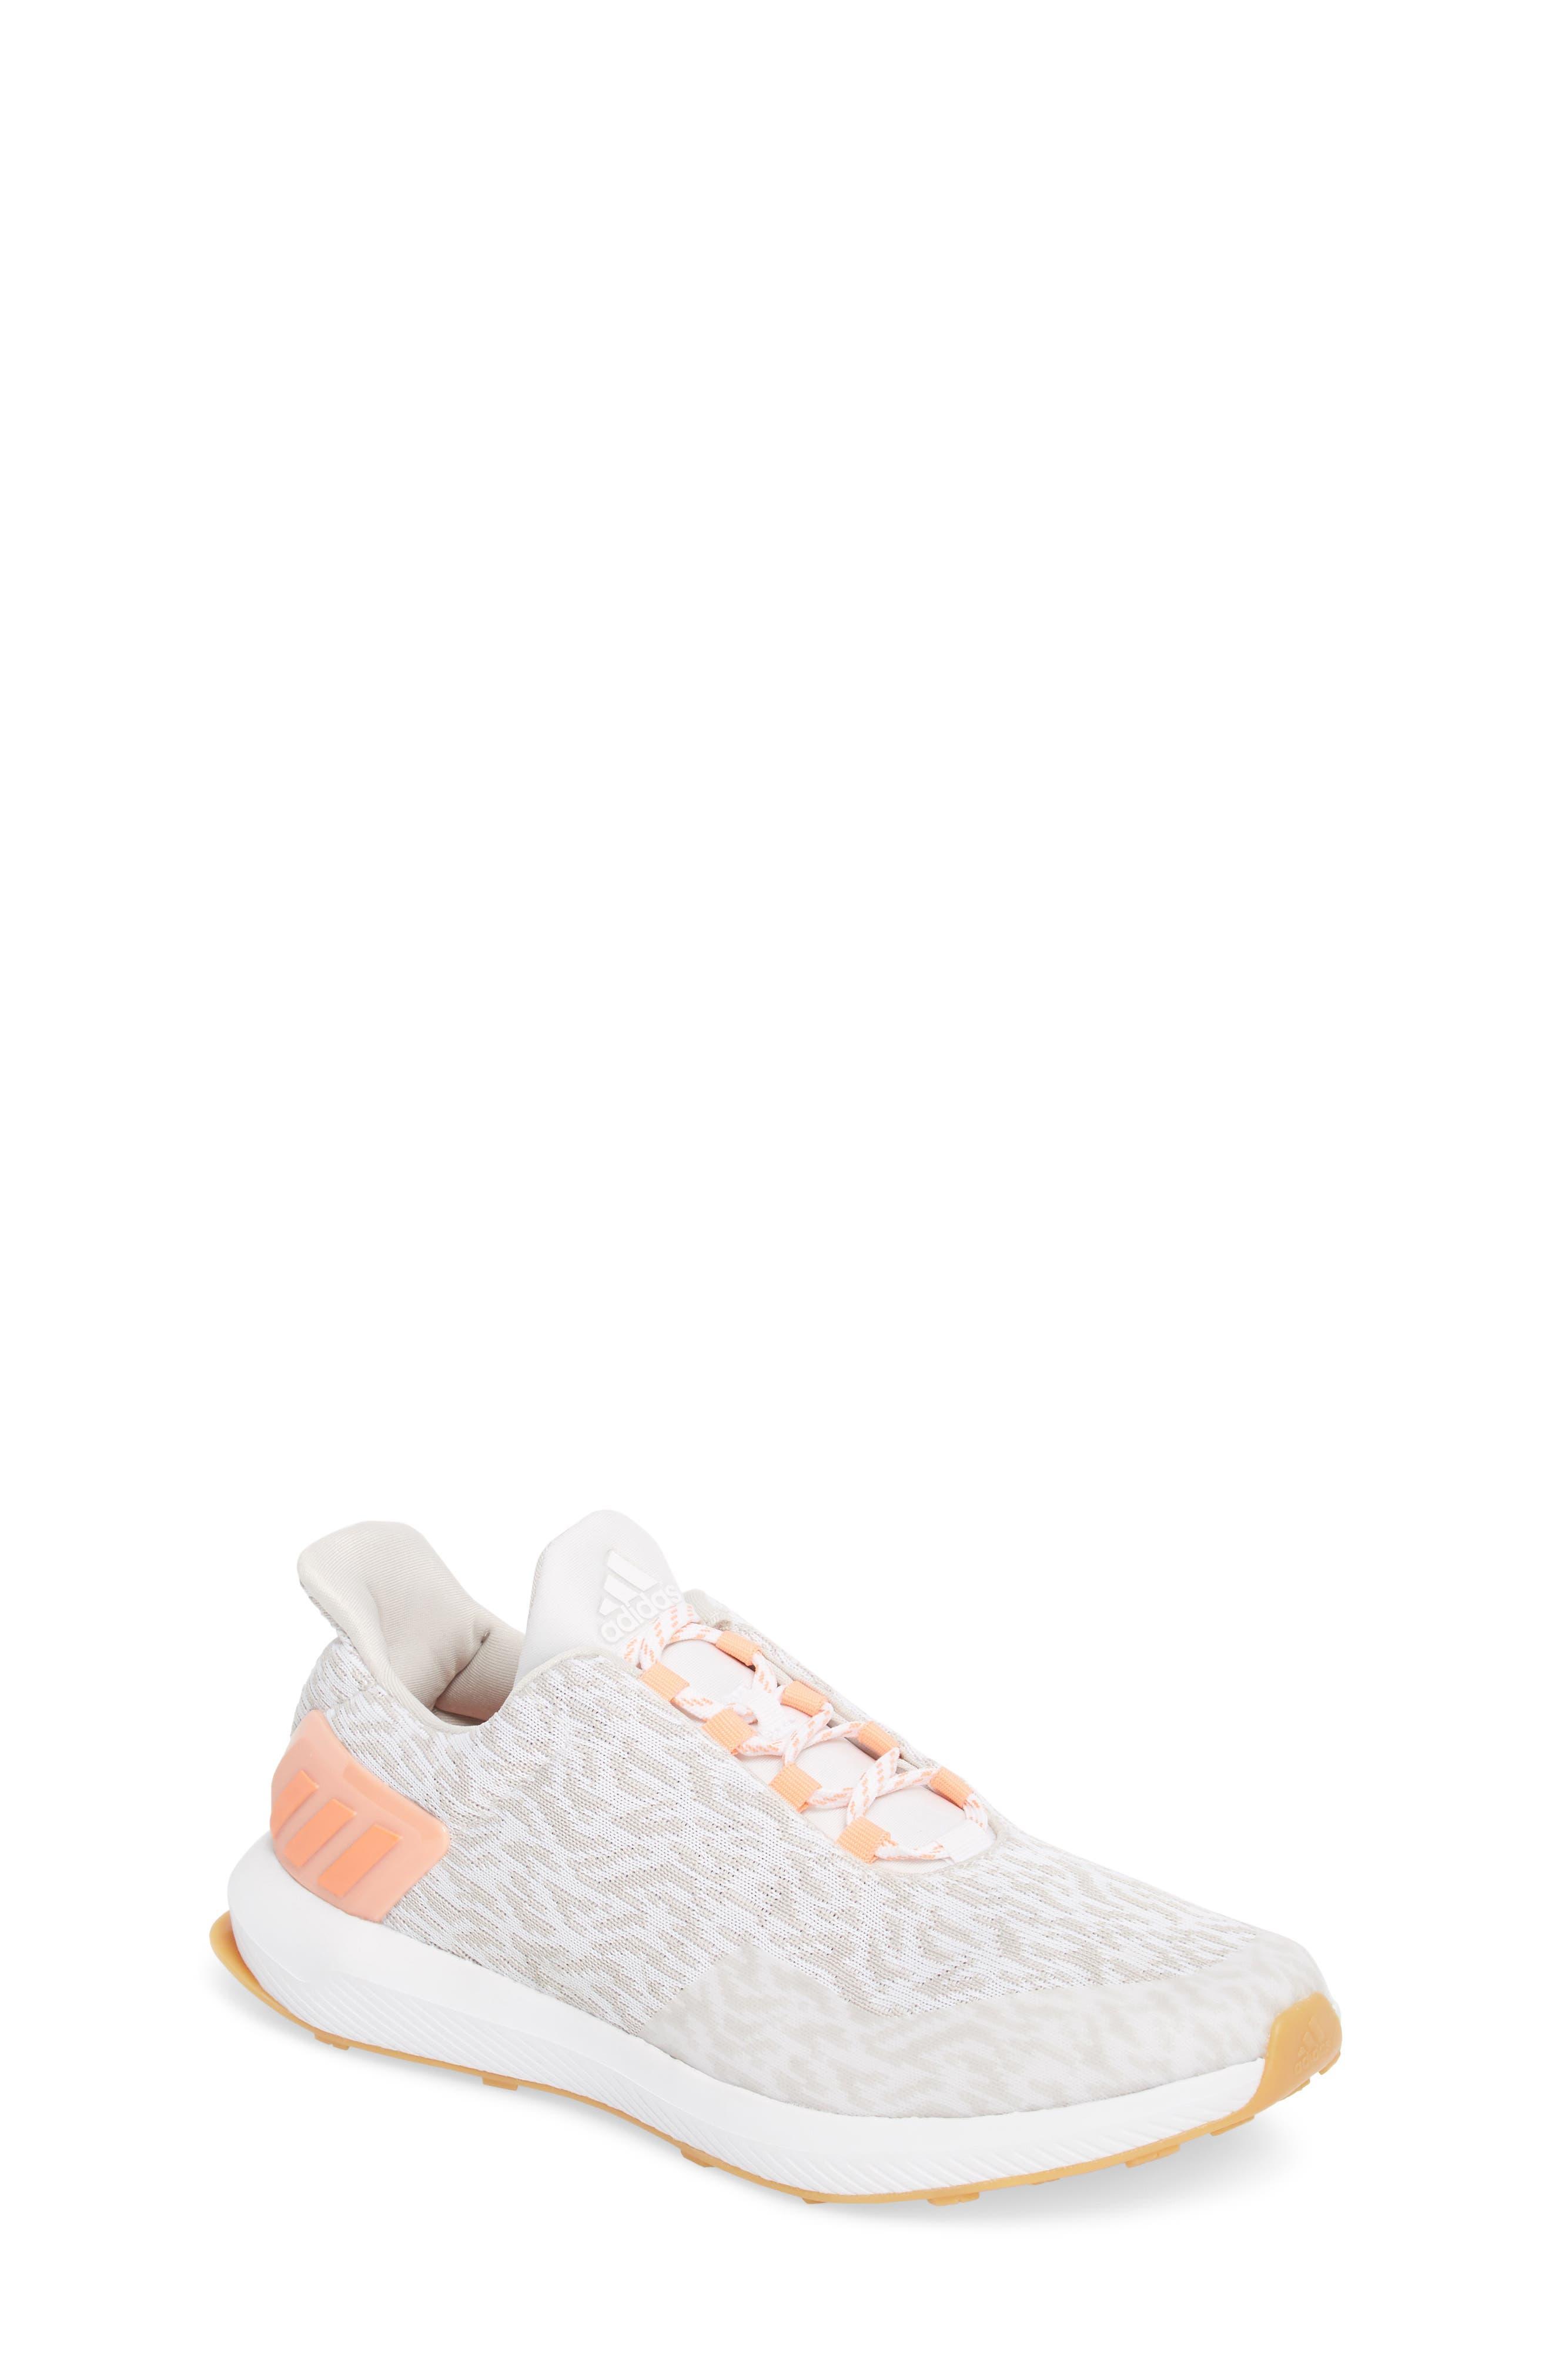 RapidaRun Uncaged Sneaker,                         Main,                         color, White / Pearl/ Coral